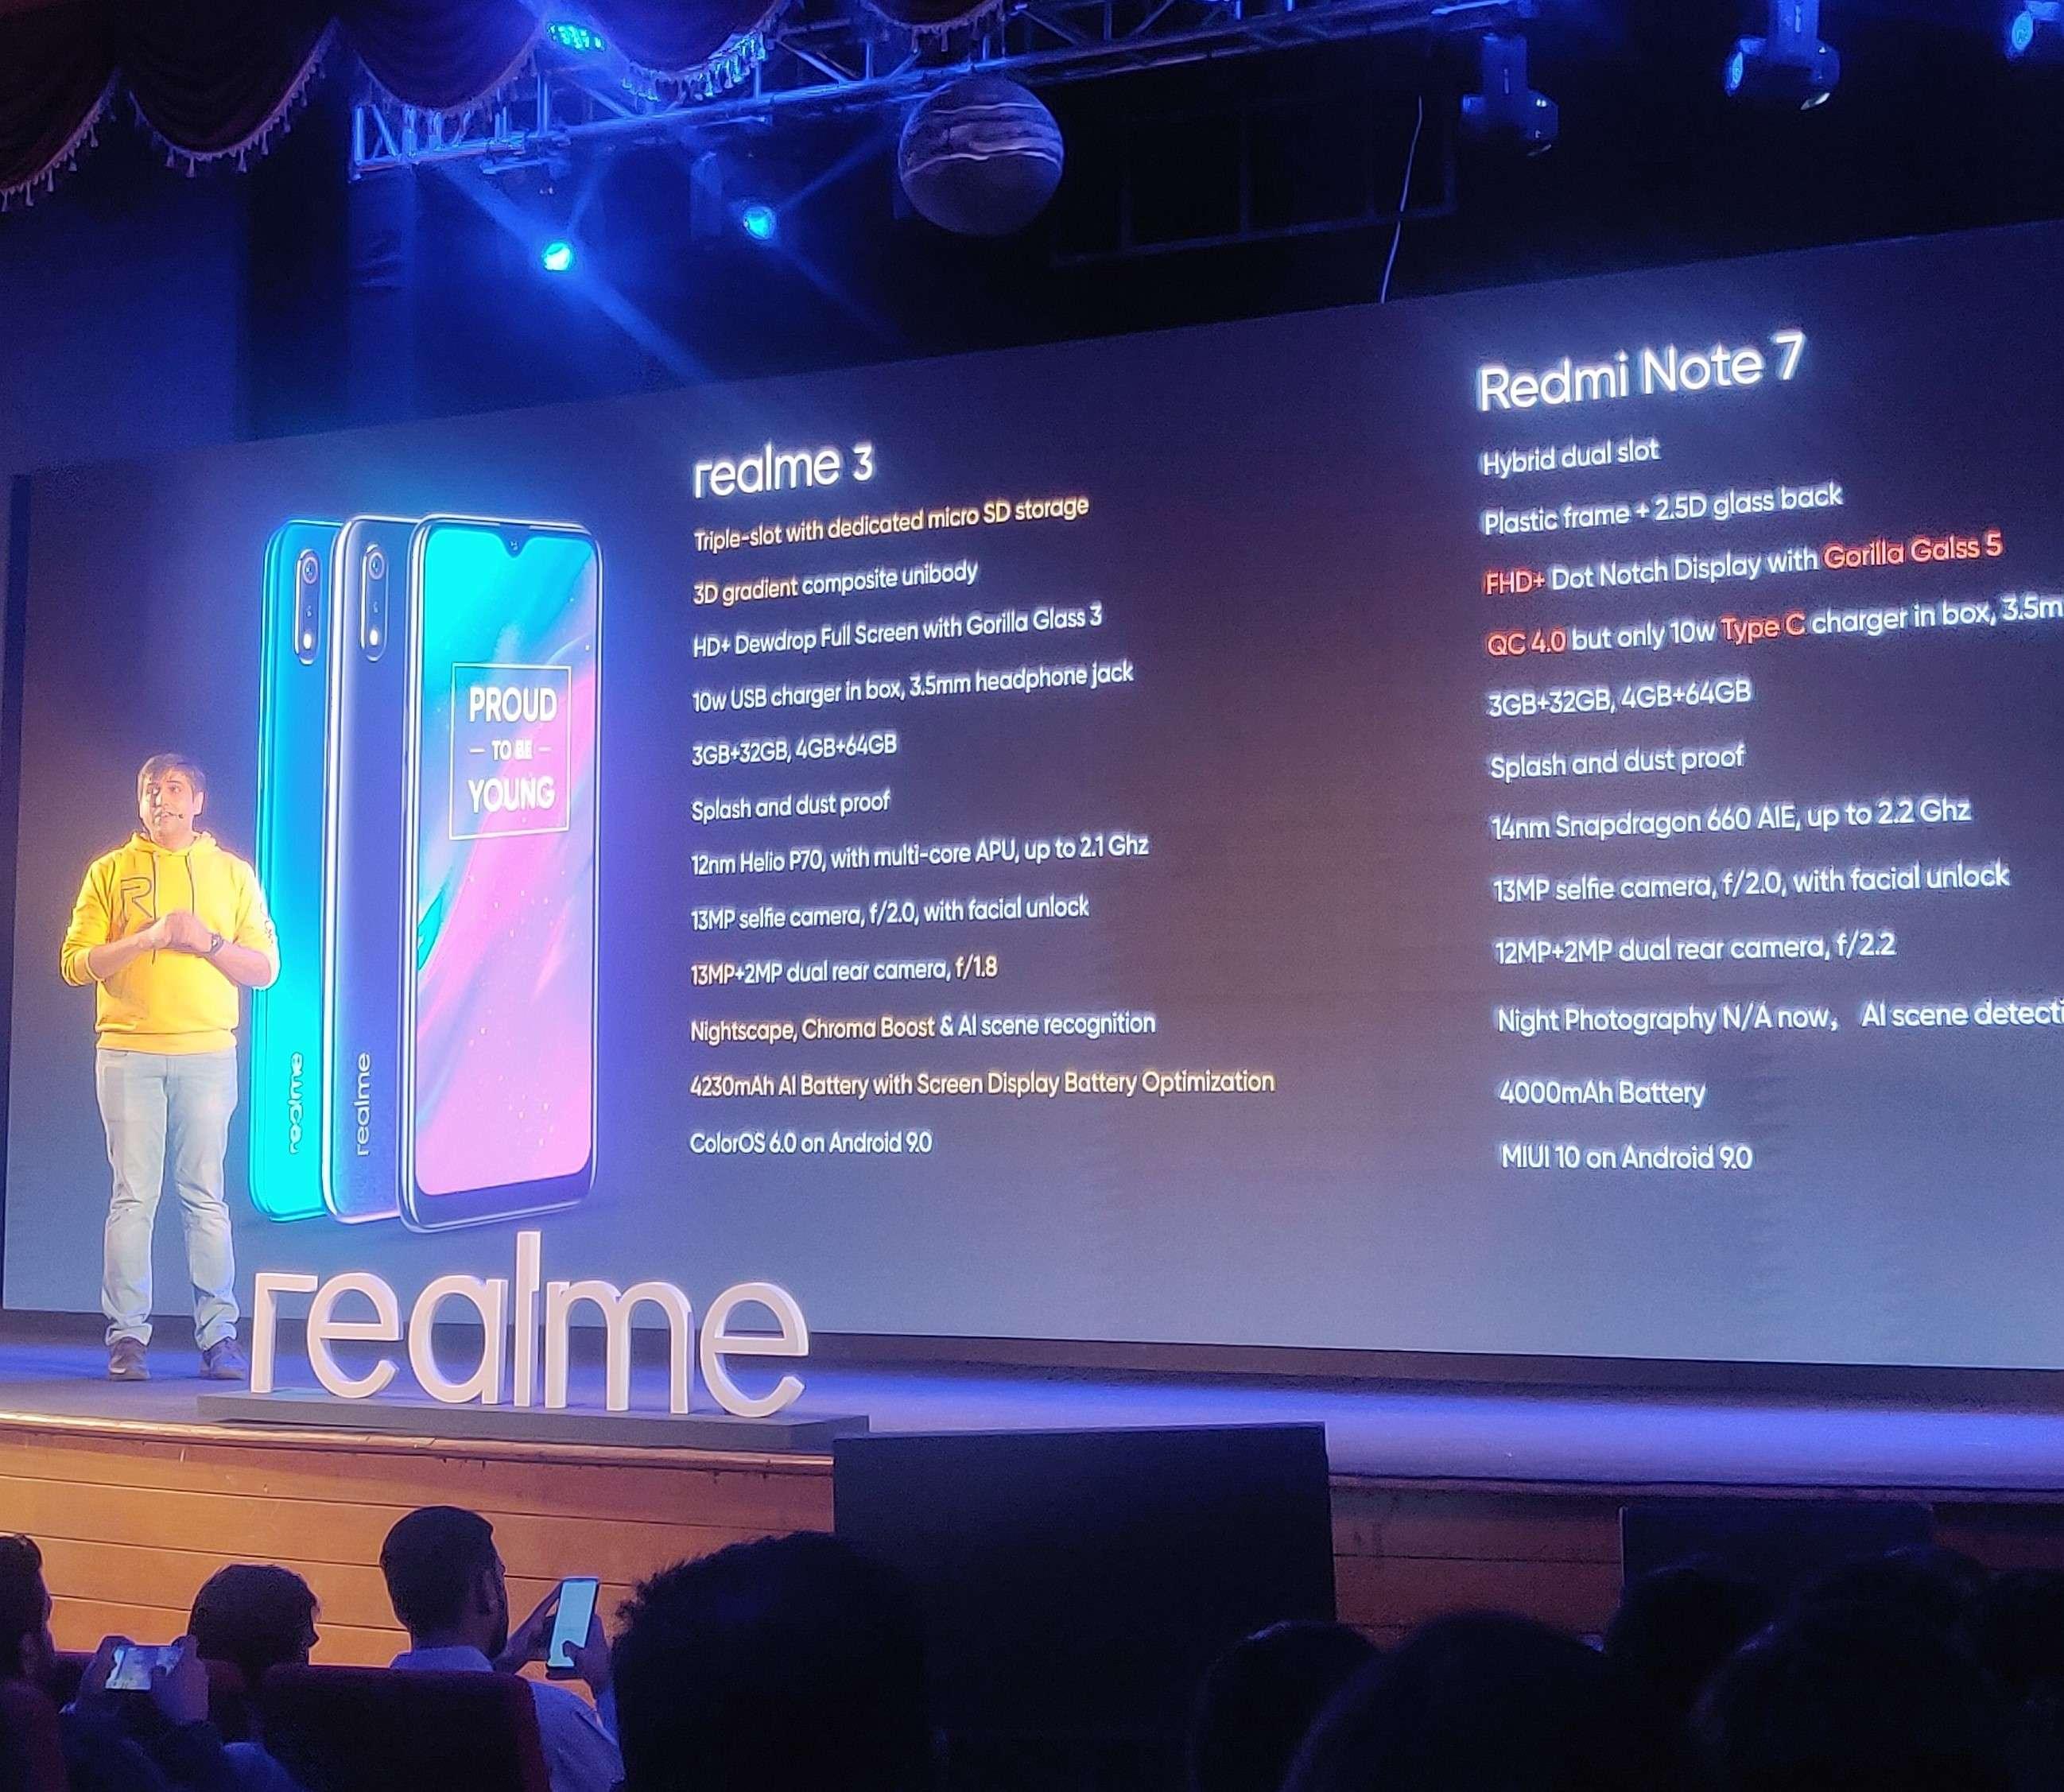 realme: Xiaomi India sees Realme as its core competitor